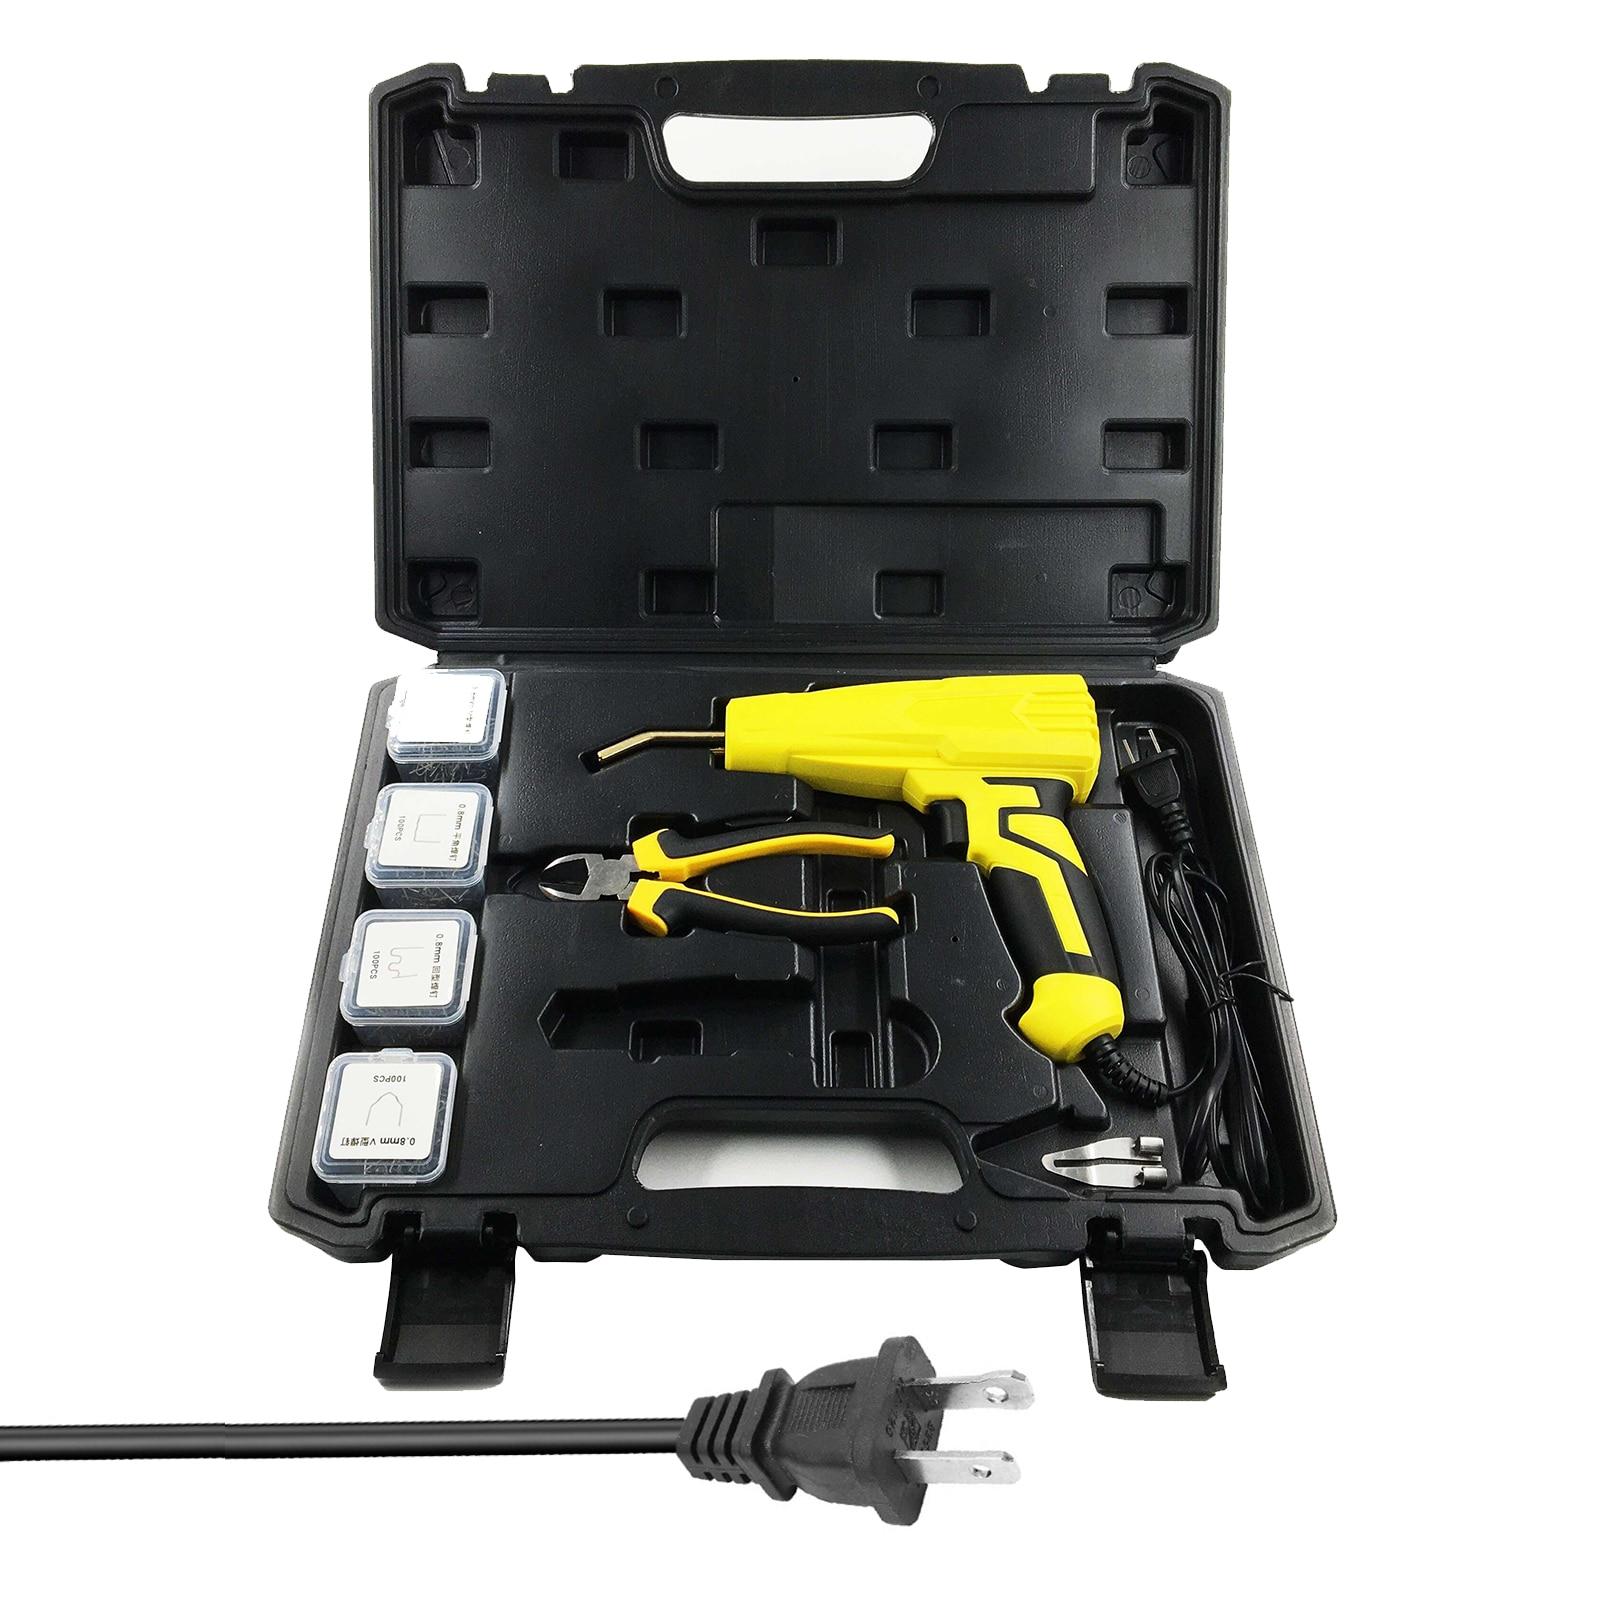 100W Portable Plastics Welding Machine Hot Staplers Plastics Welding Tools Repairings Tools Stapler Welding Tool